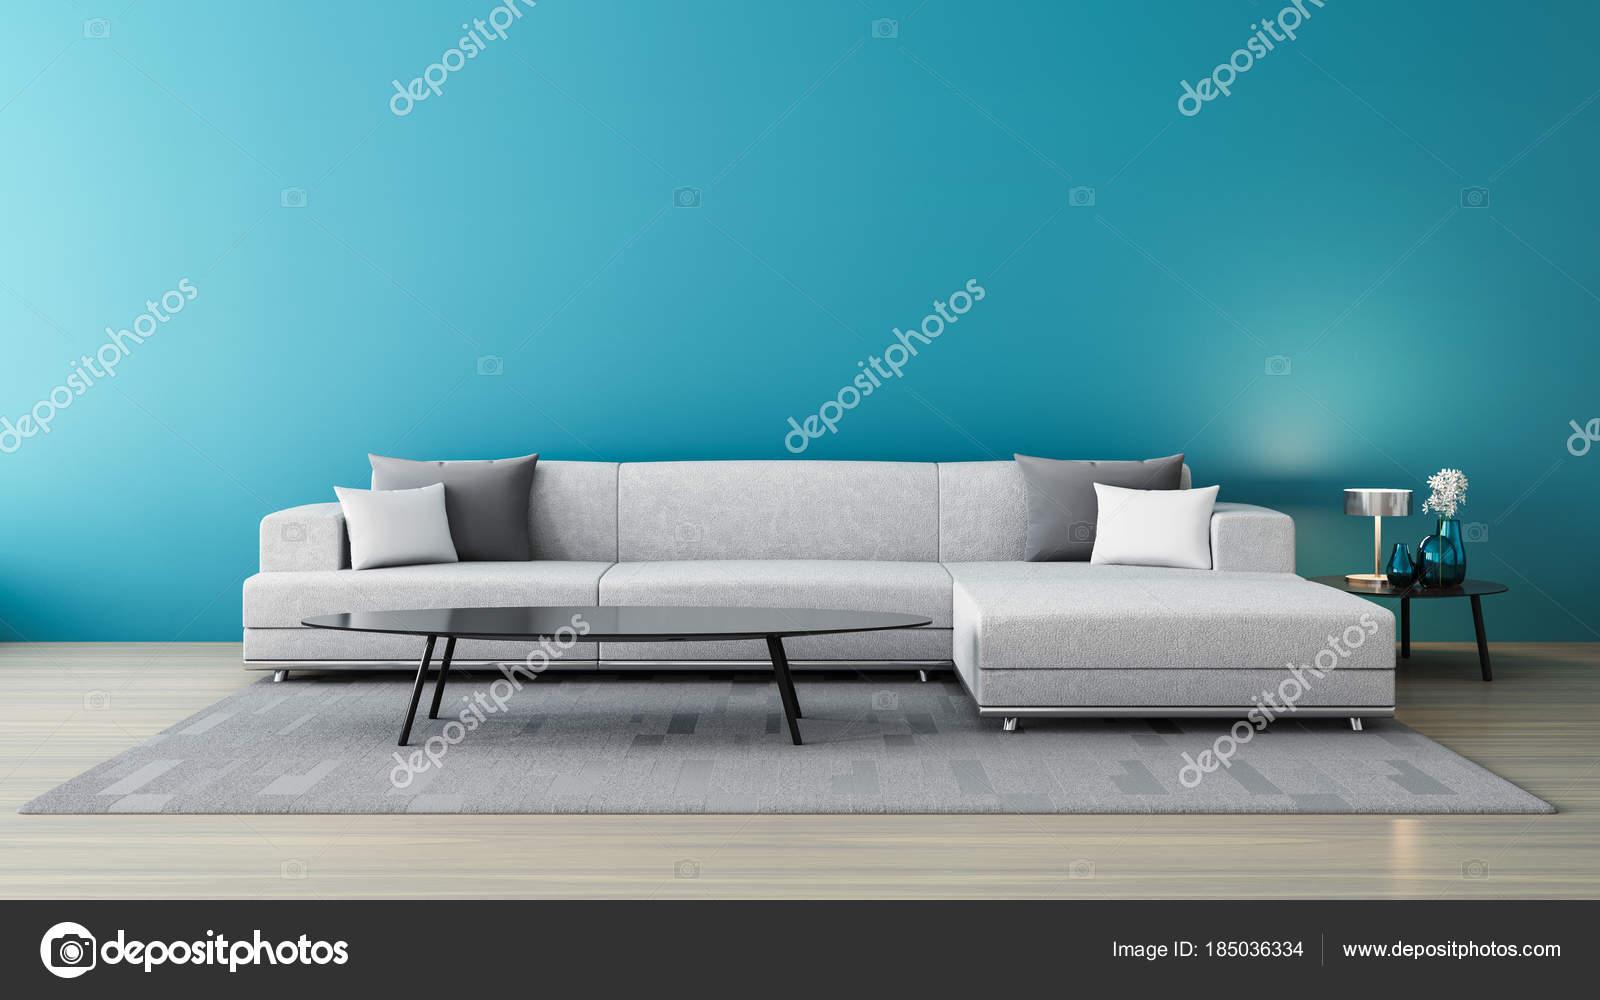 Stunning Blauwe Muur Woonkamer Ideas - New Home Design 2018 ...